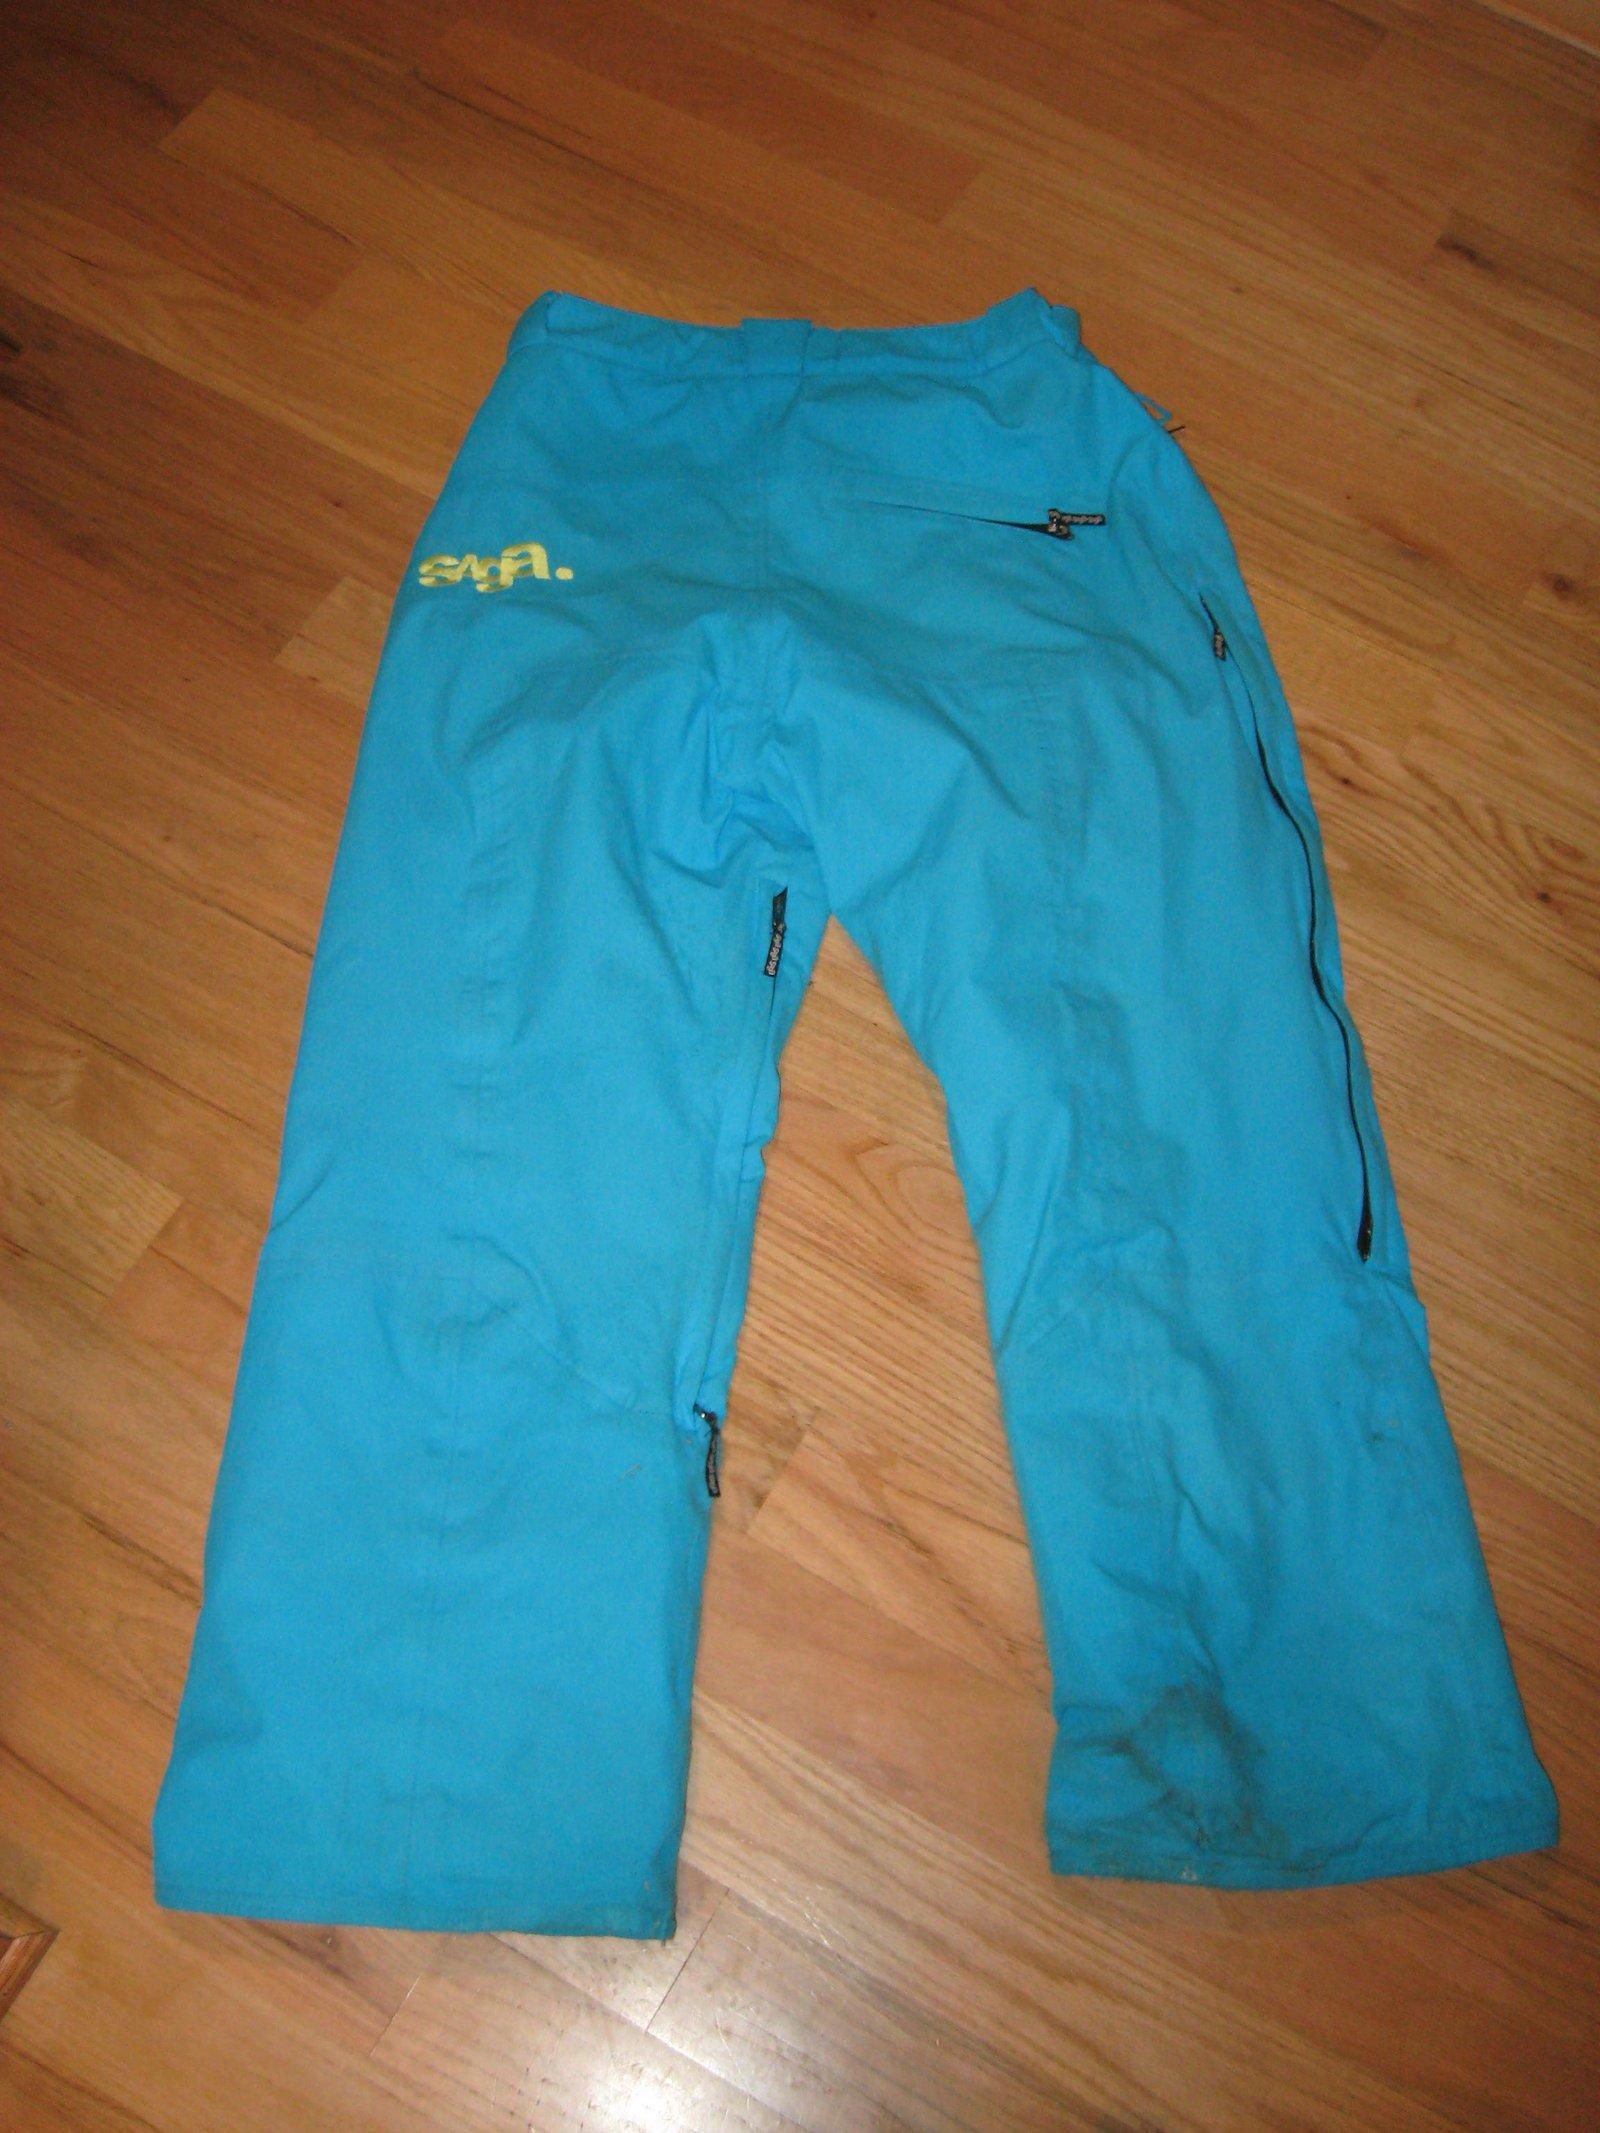 Back of my pants